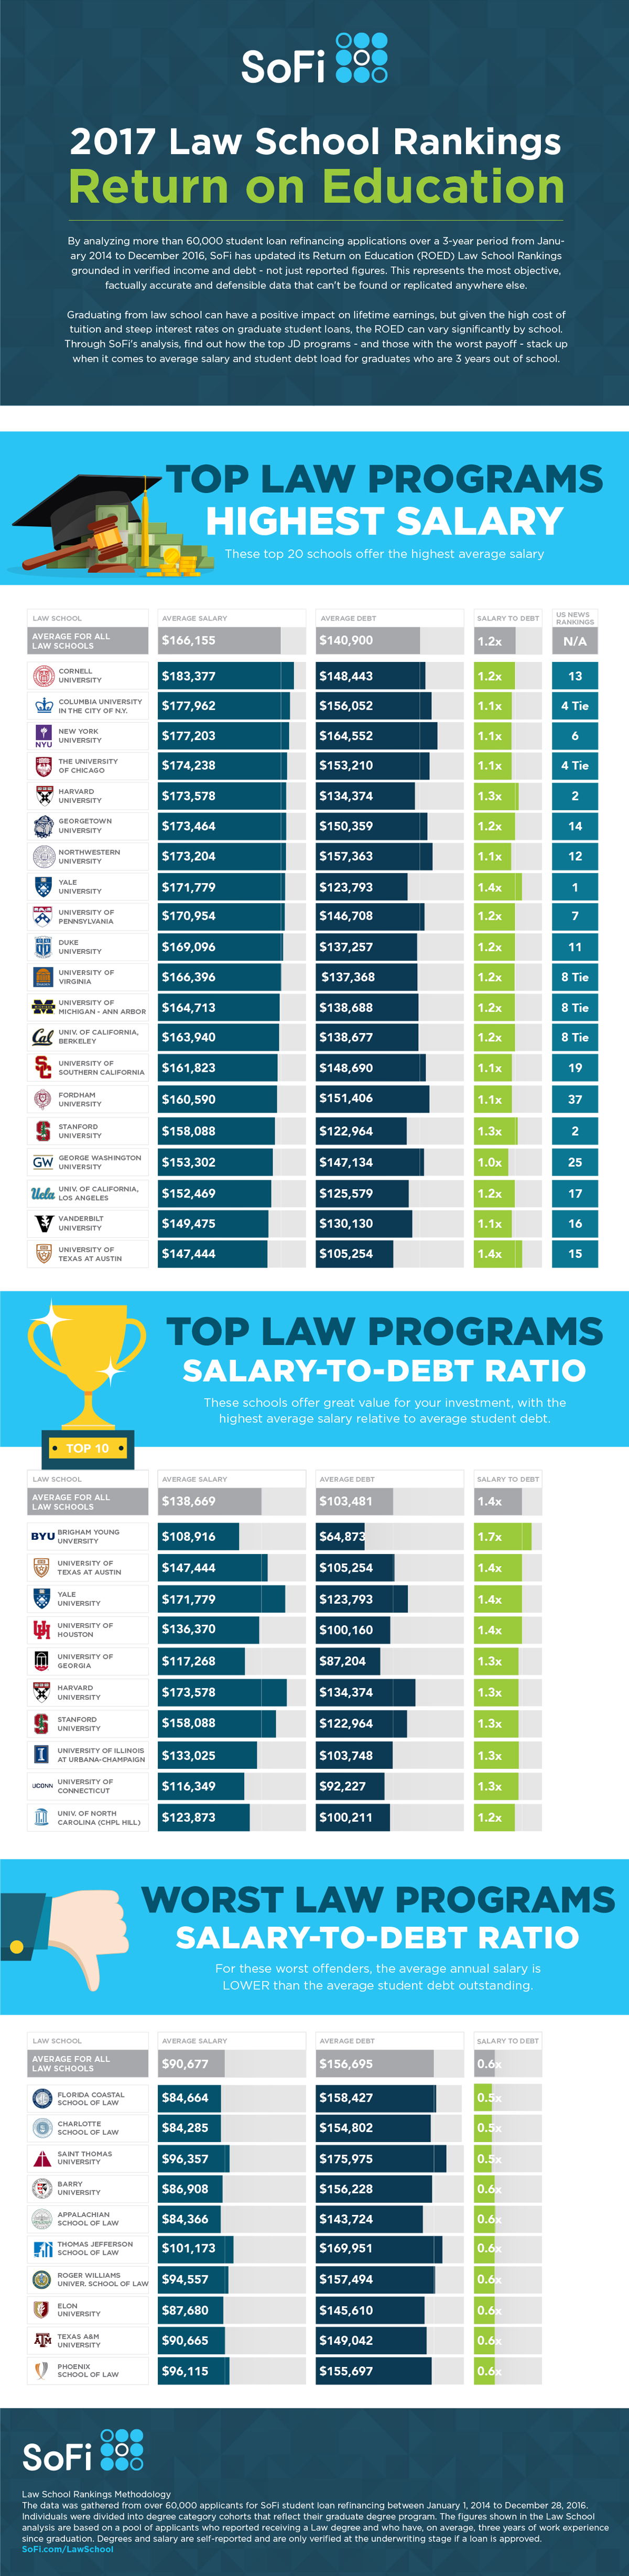 SoFi ROEd Inforgraphic - Law School Rankings